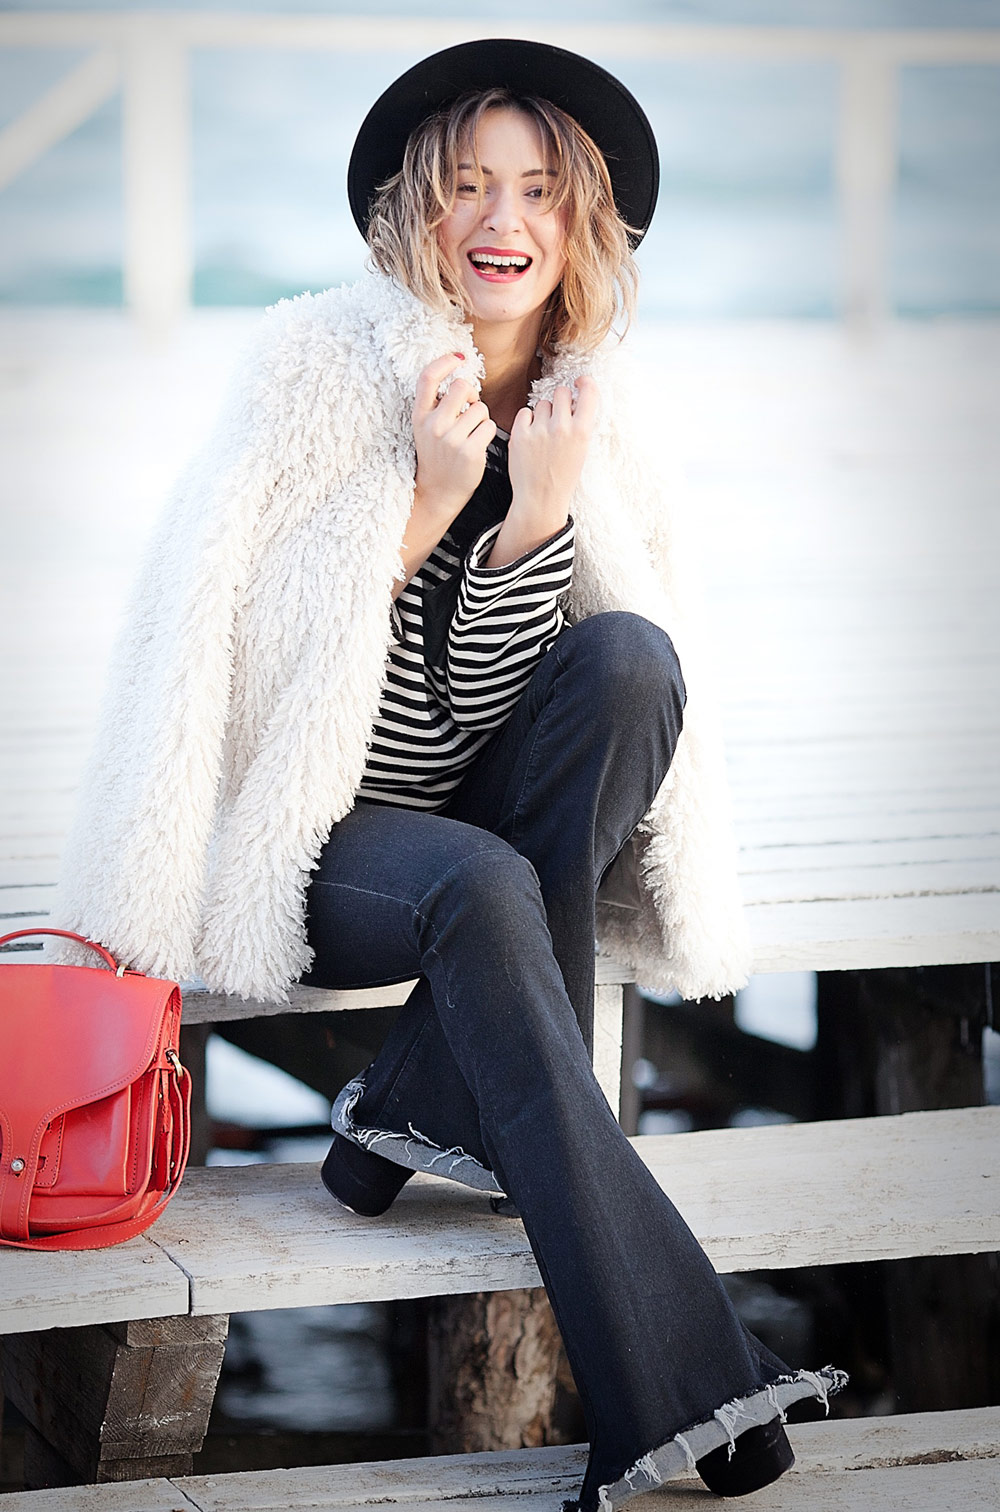 fashion-blogger-galant-girl-blog